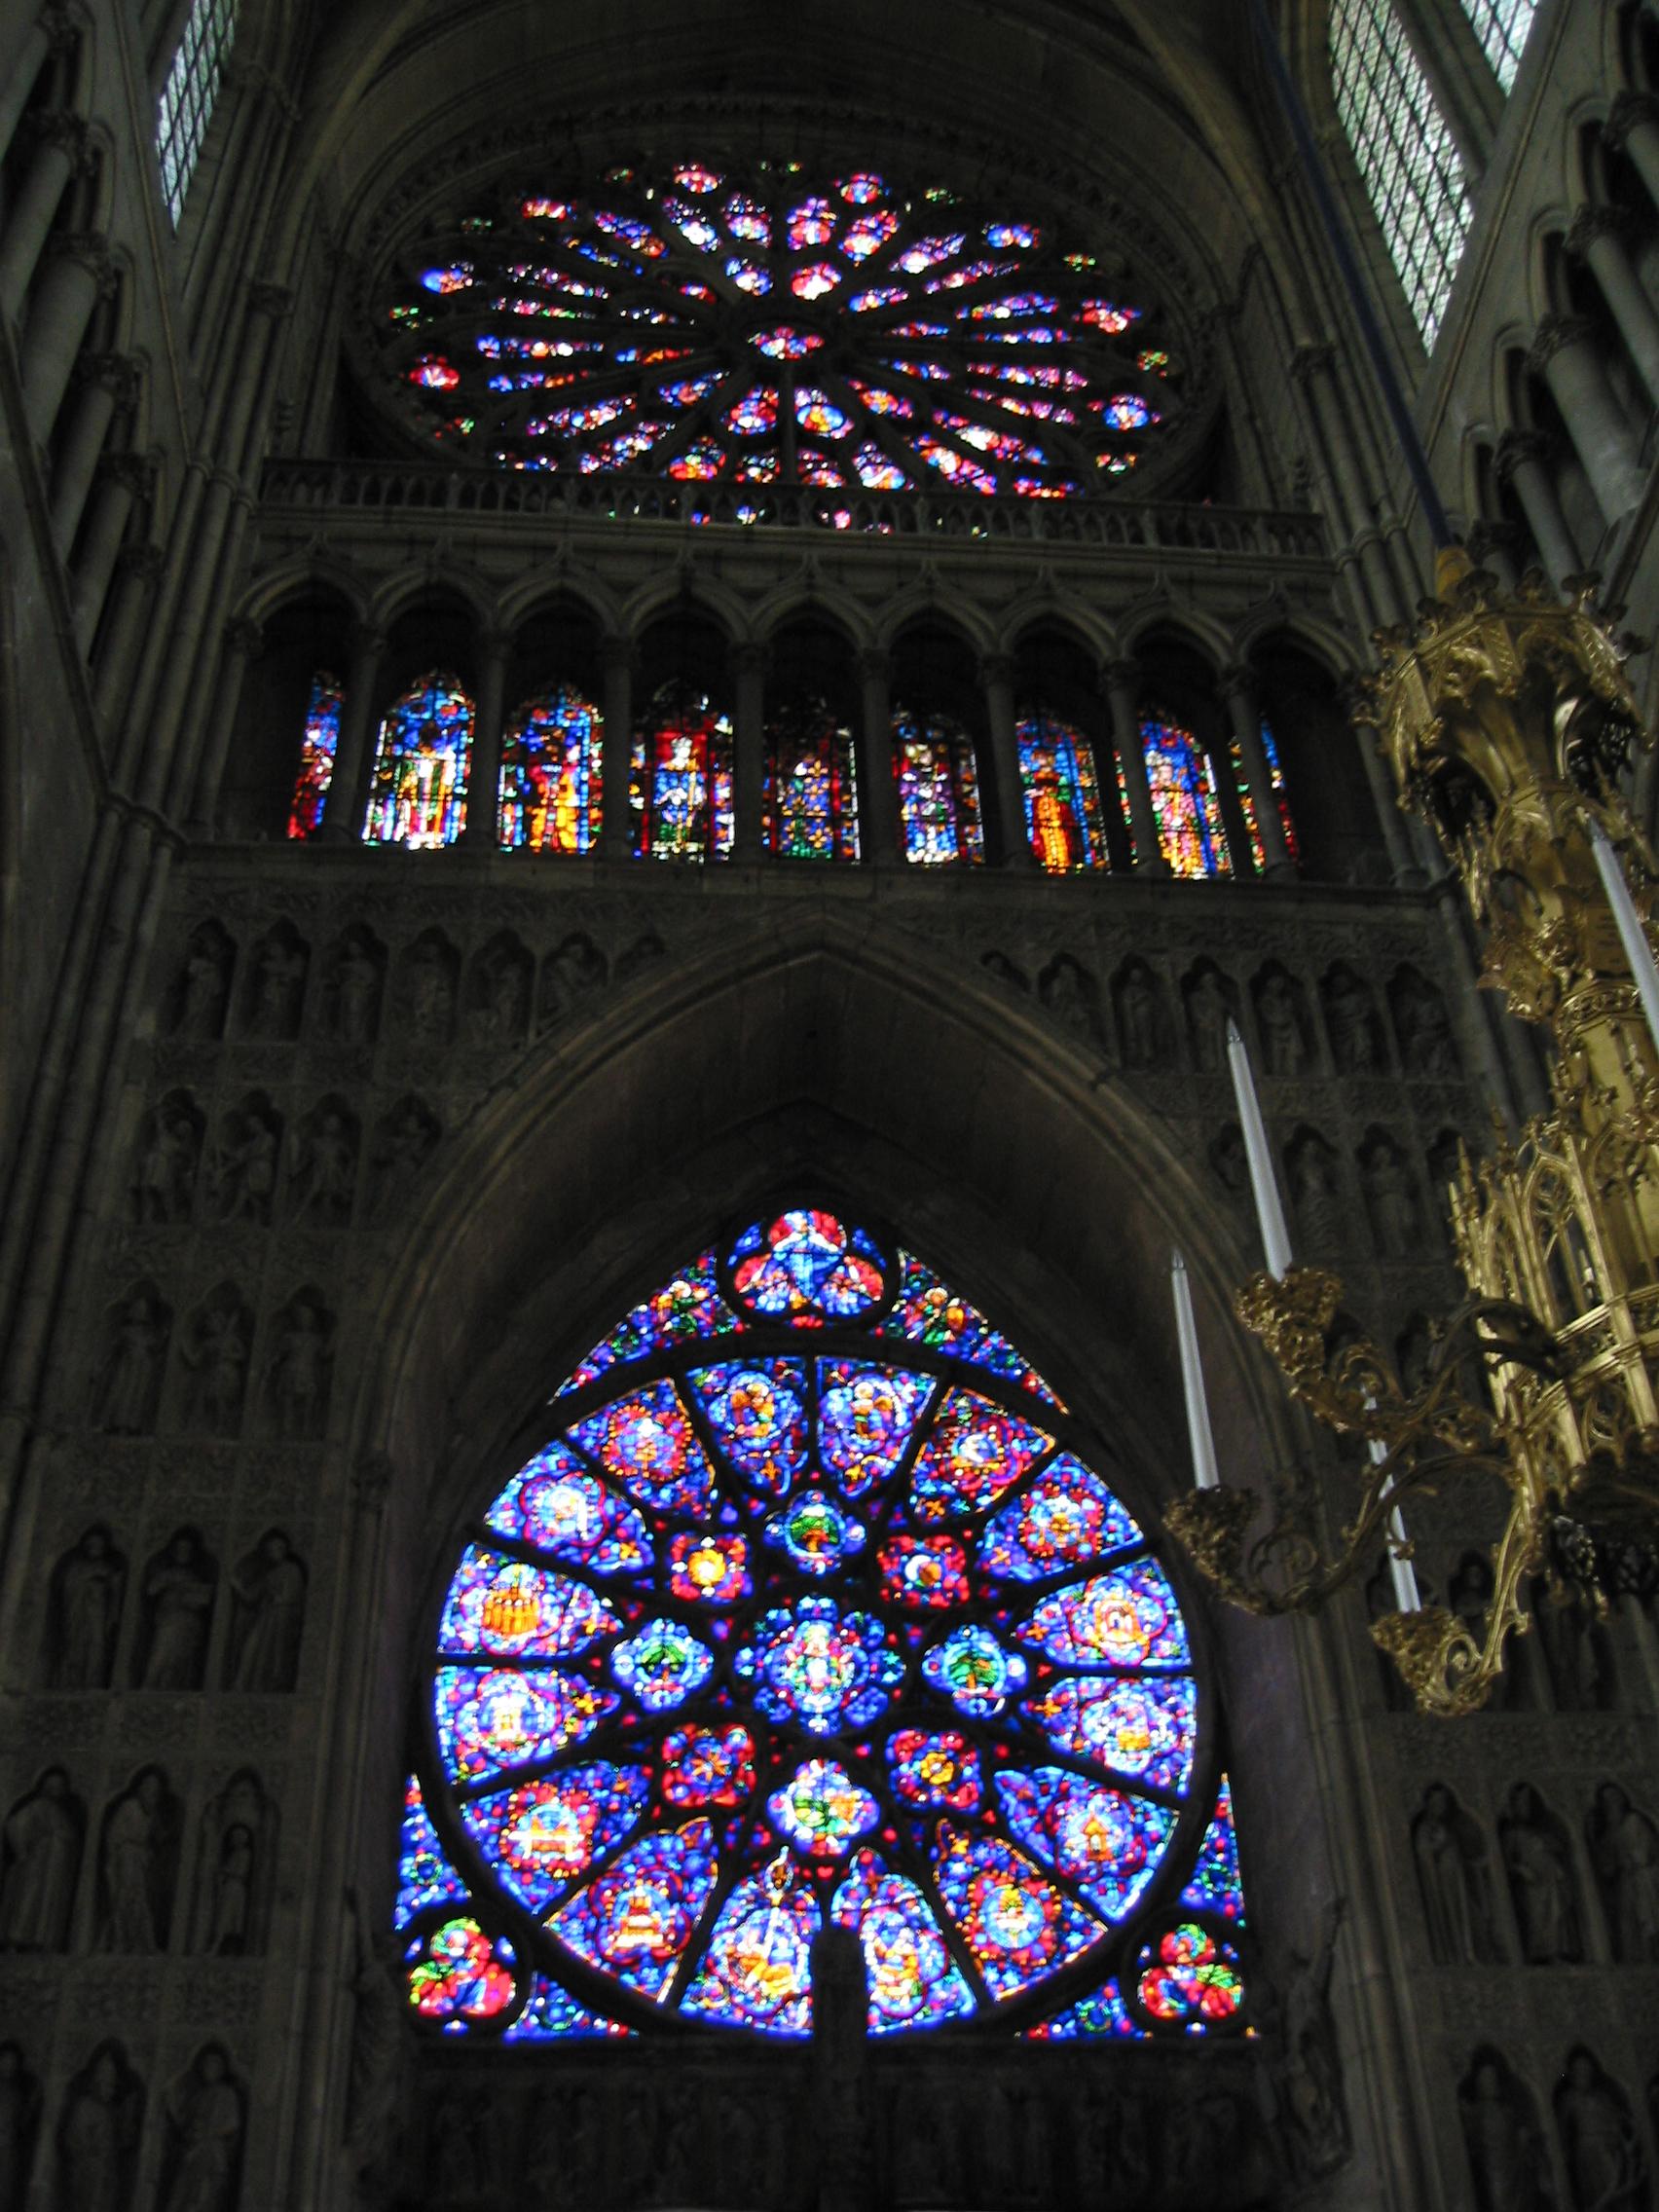 El vitral o vitraux taringa - Vidrieras de colores ...